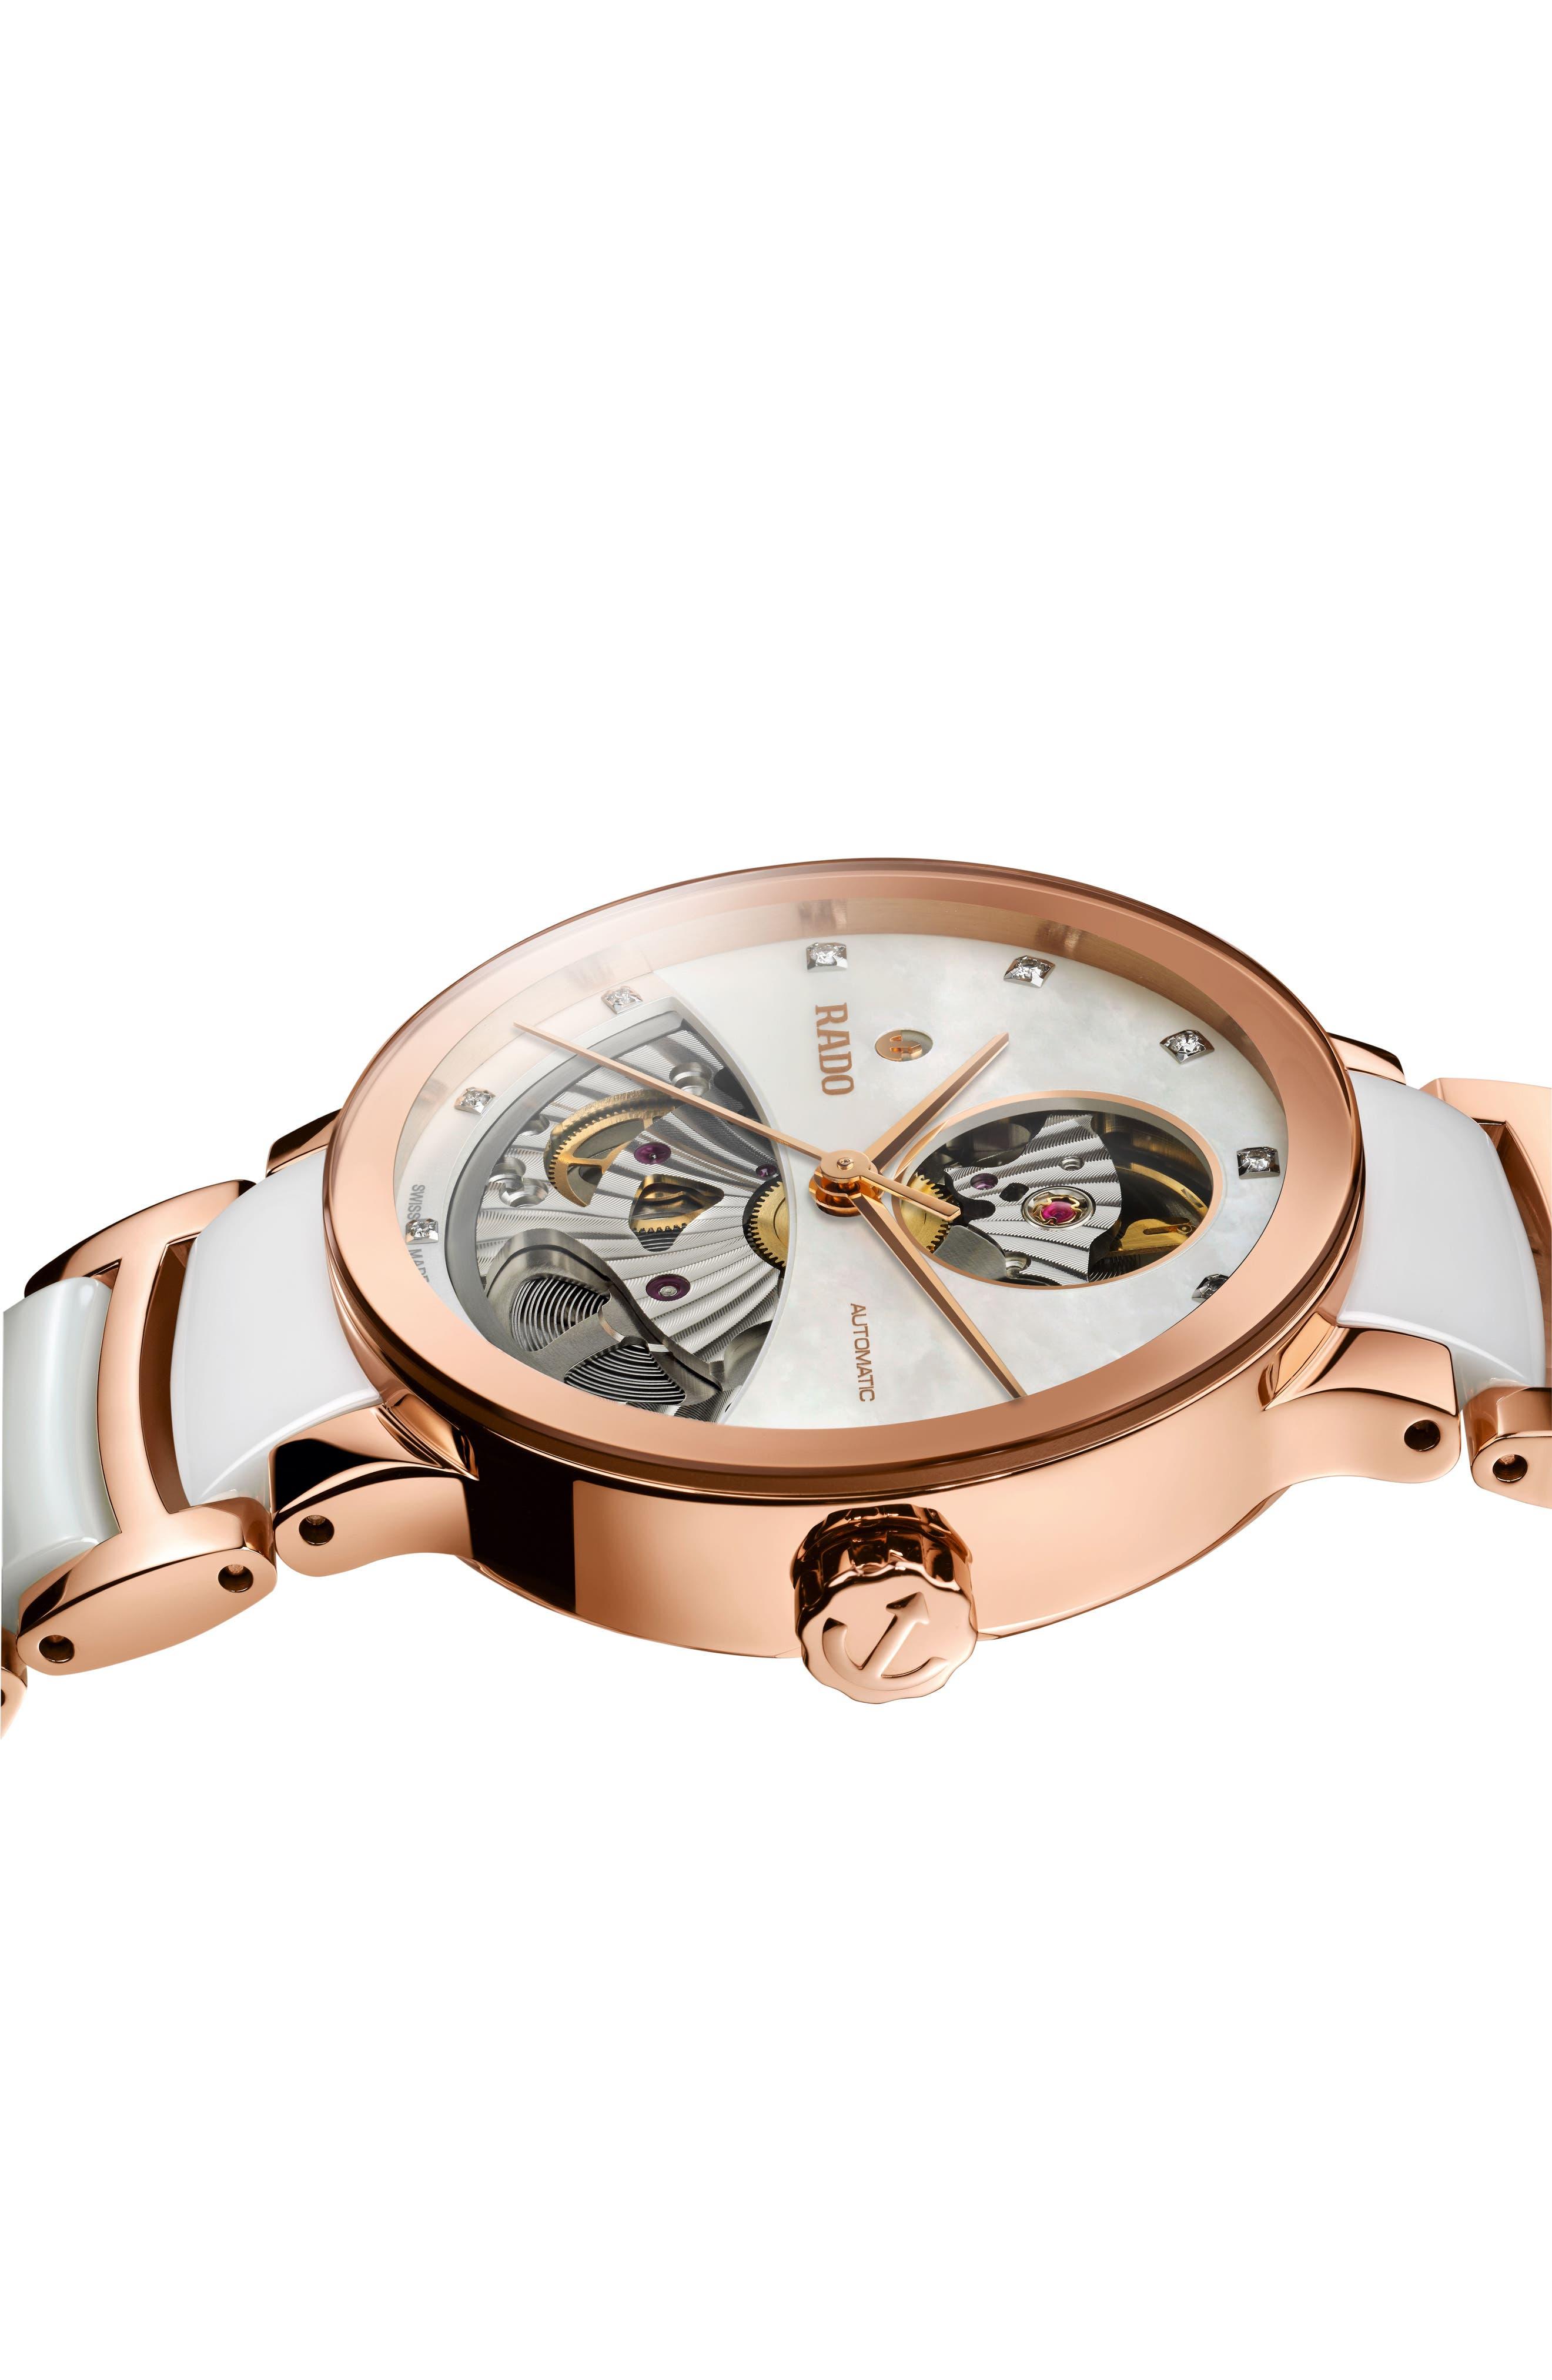 RADO,                             Centrix Open Heart Automatic Diamond Ceramic Bracelet Watch, 33mm,                             Alternate thumbnail 2, color,                             WHITE/ MOP/ ROSE GOLD